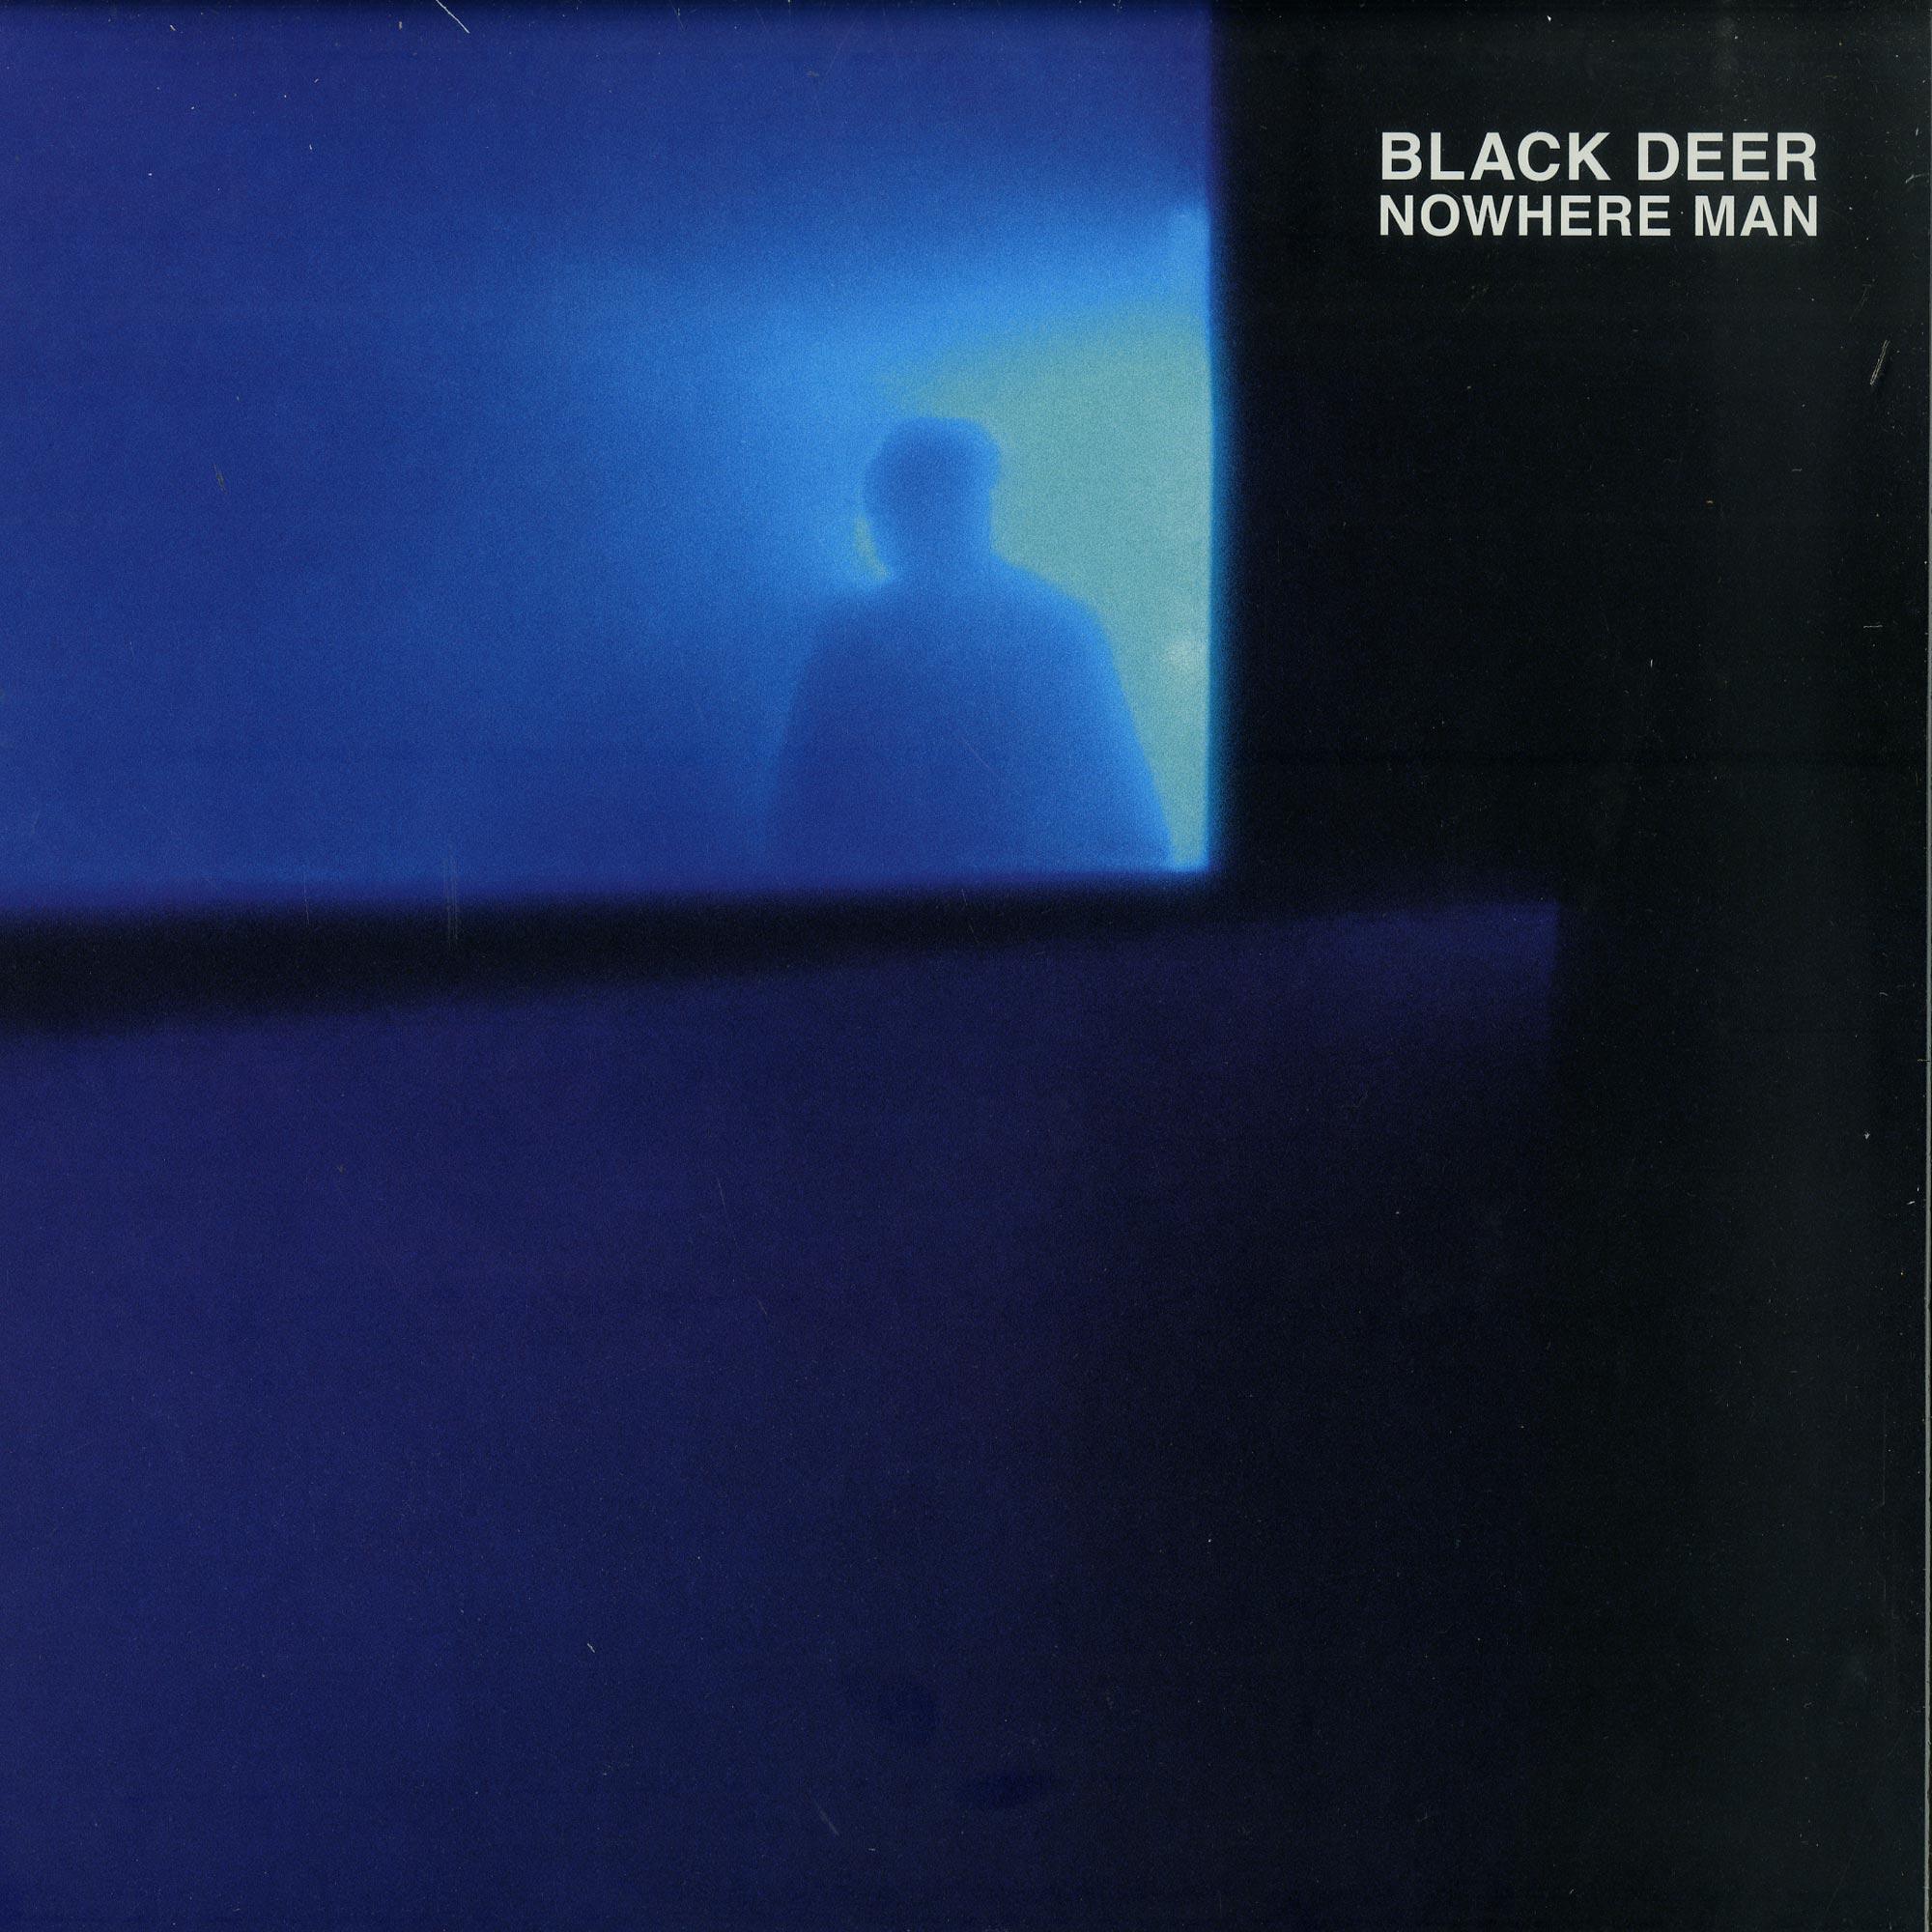 Black Deer - NOWHERE MAN